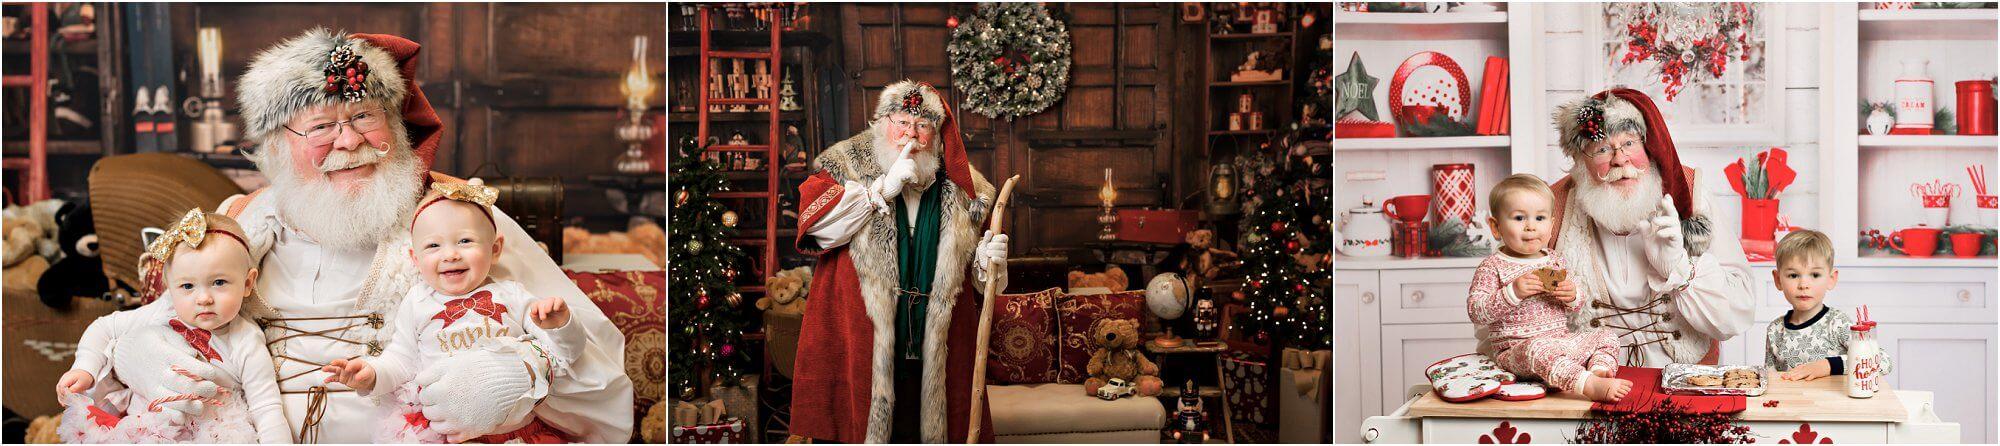 Santa header image